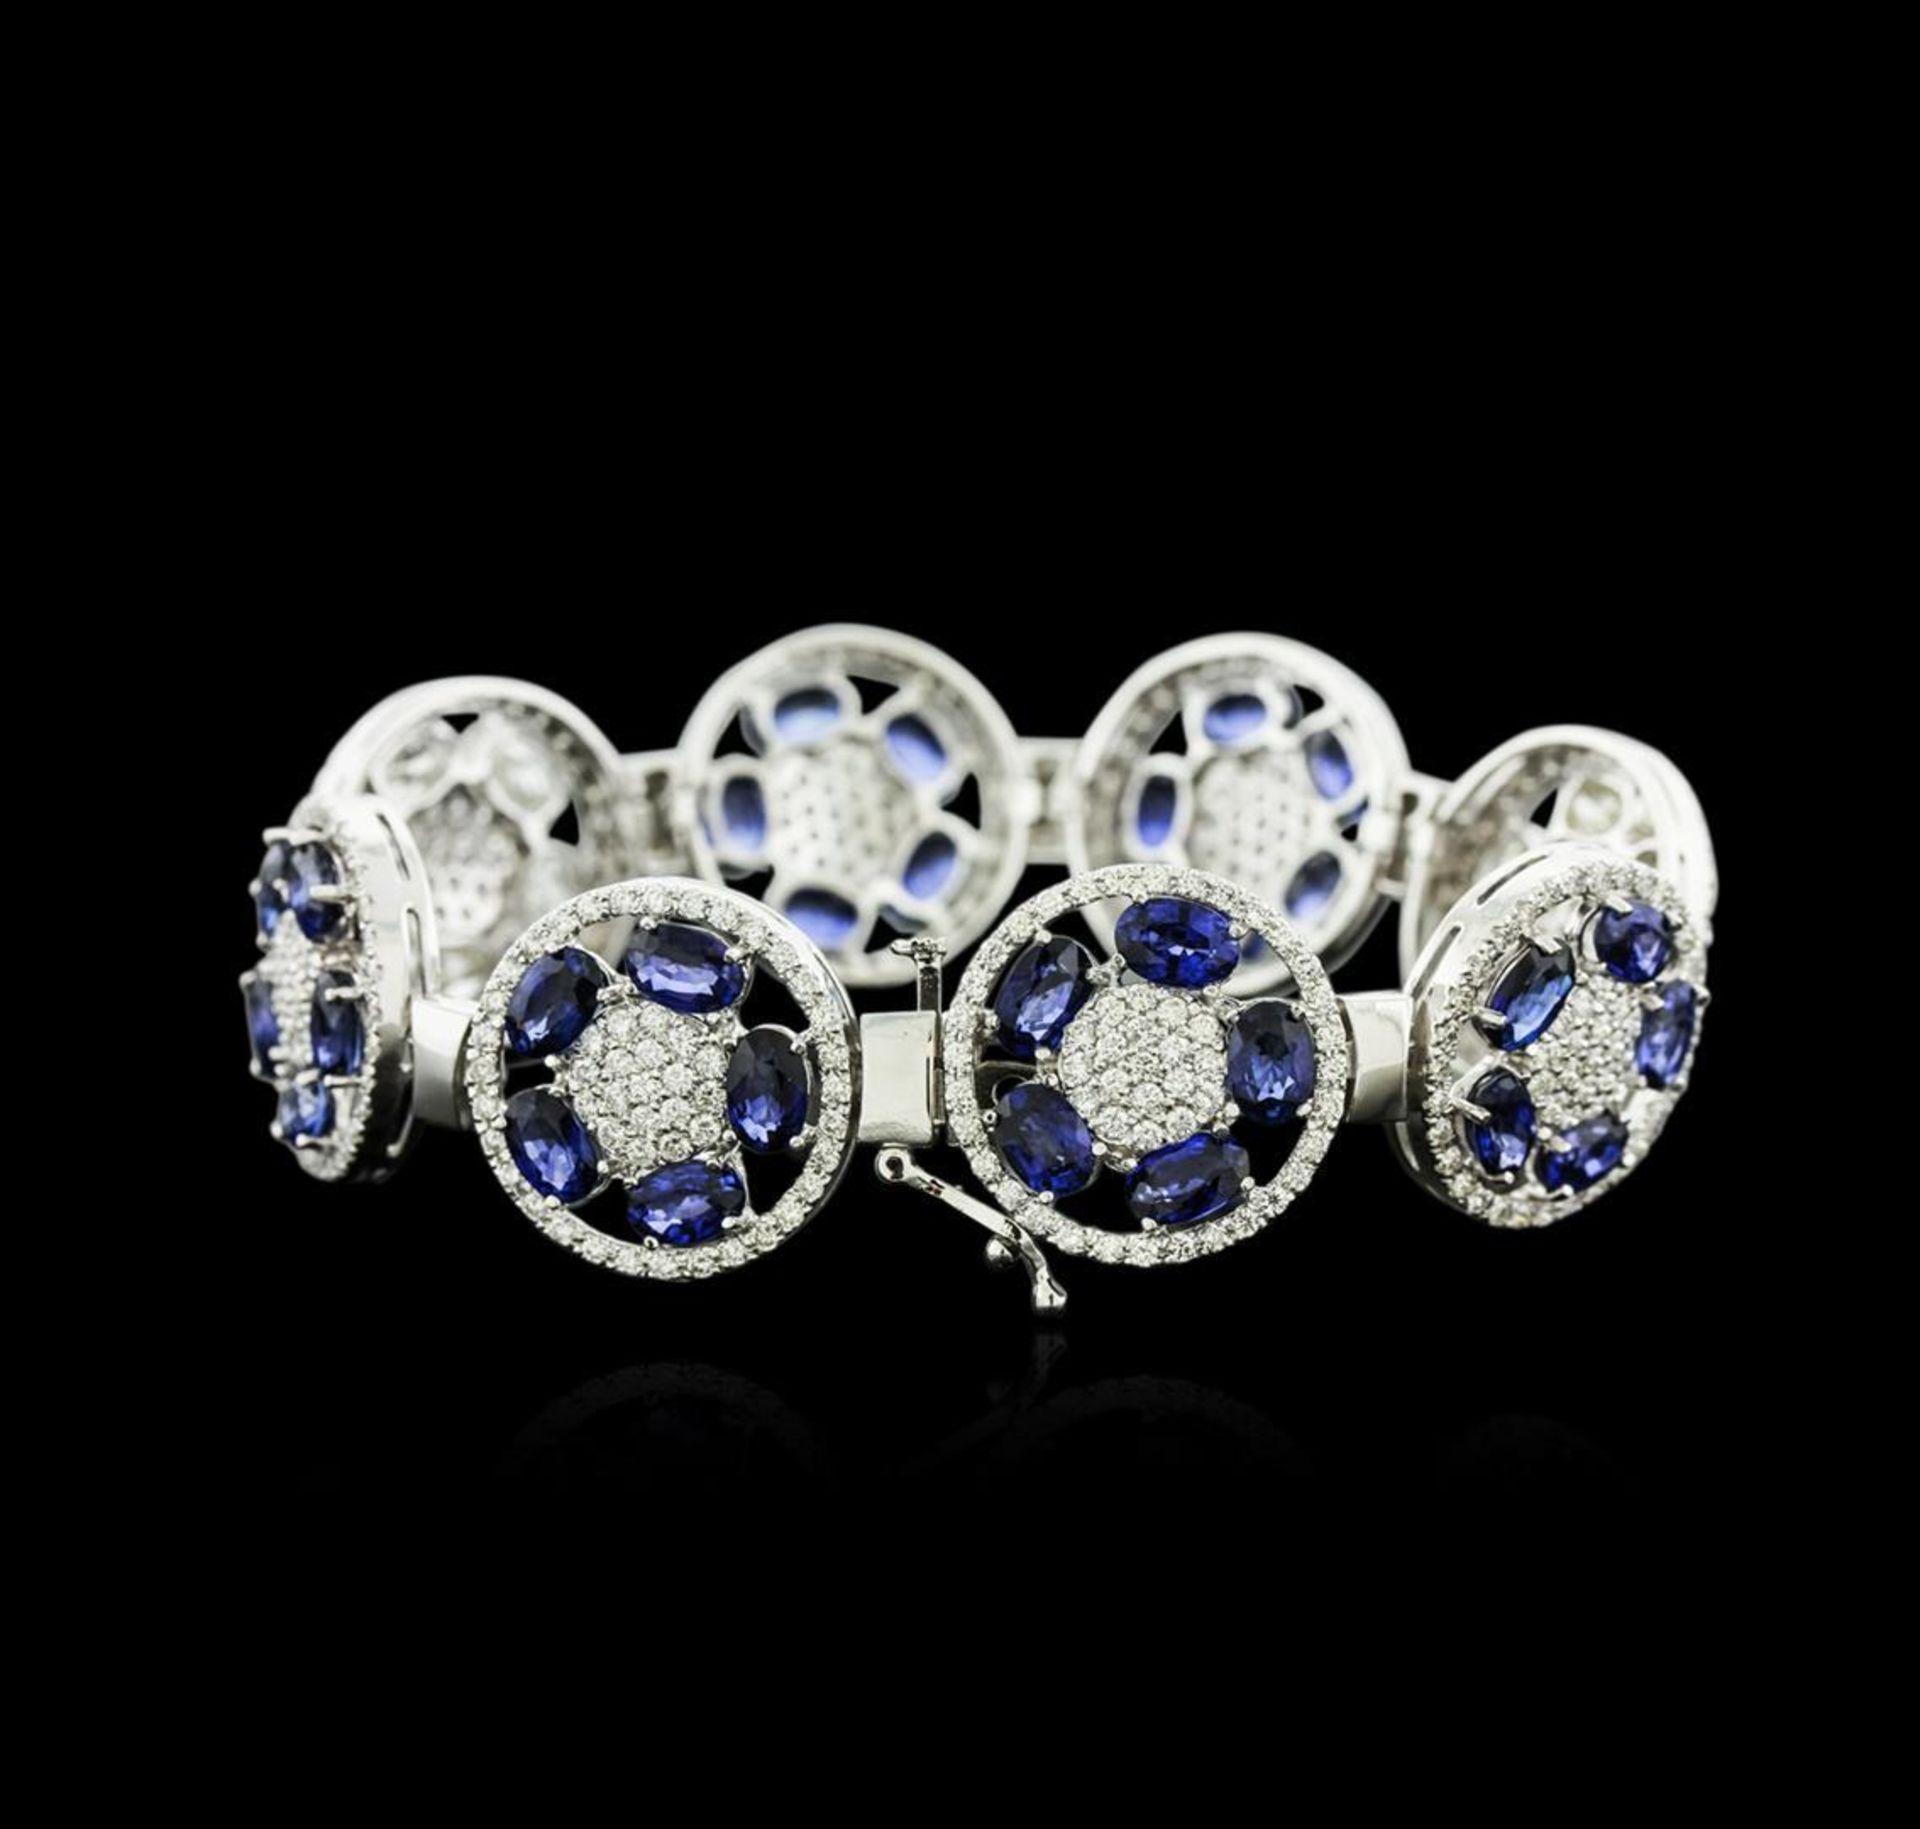 14KT White Gold 21.00 ctw Sapphire and Diamond Bracelet - Image 3 of 4